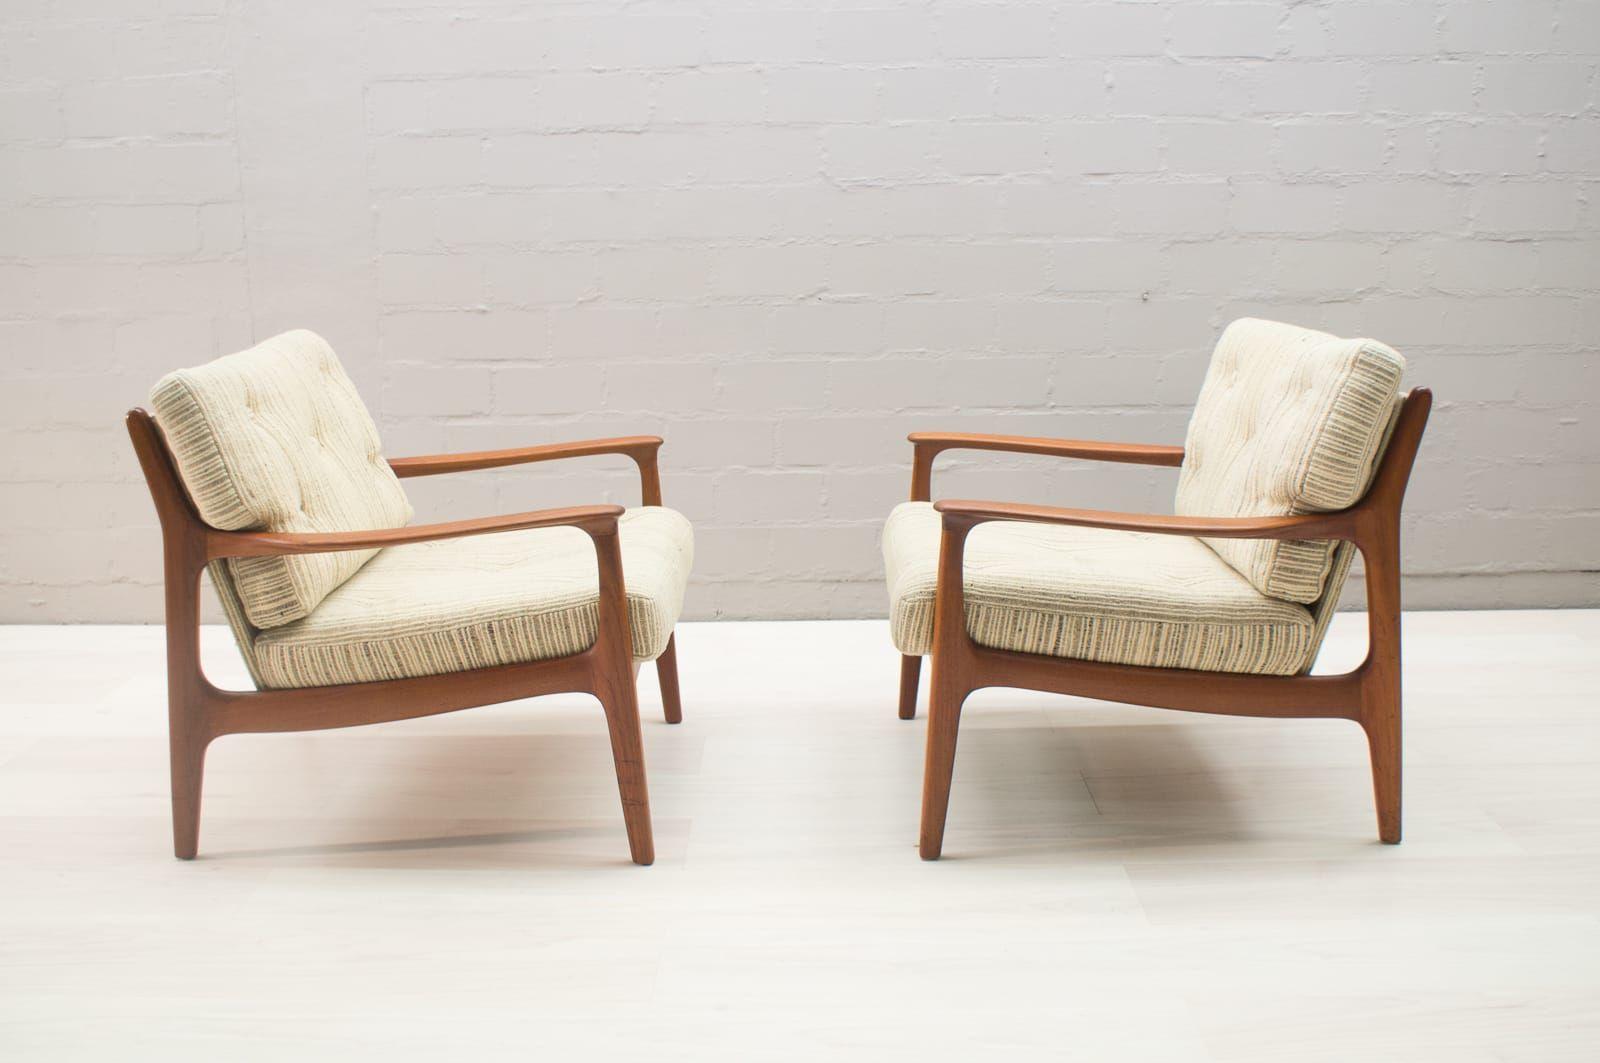 skandinavisches vintage teak sofa mit 3 sesseln bei pamono kaufen. Black Bedroom Furniture Sets. Home Design Ideas